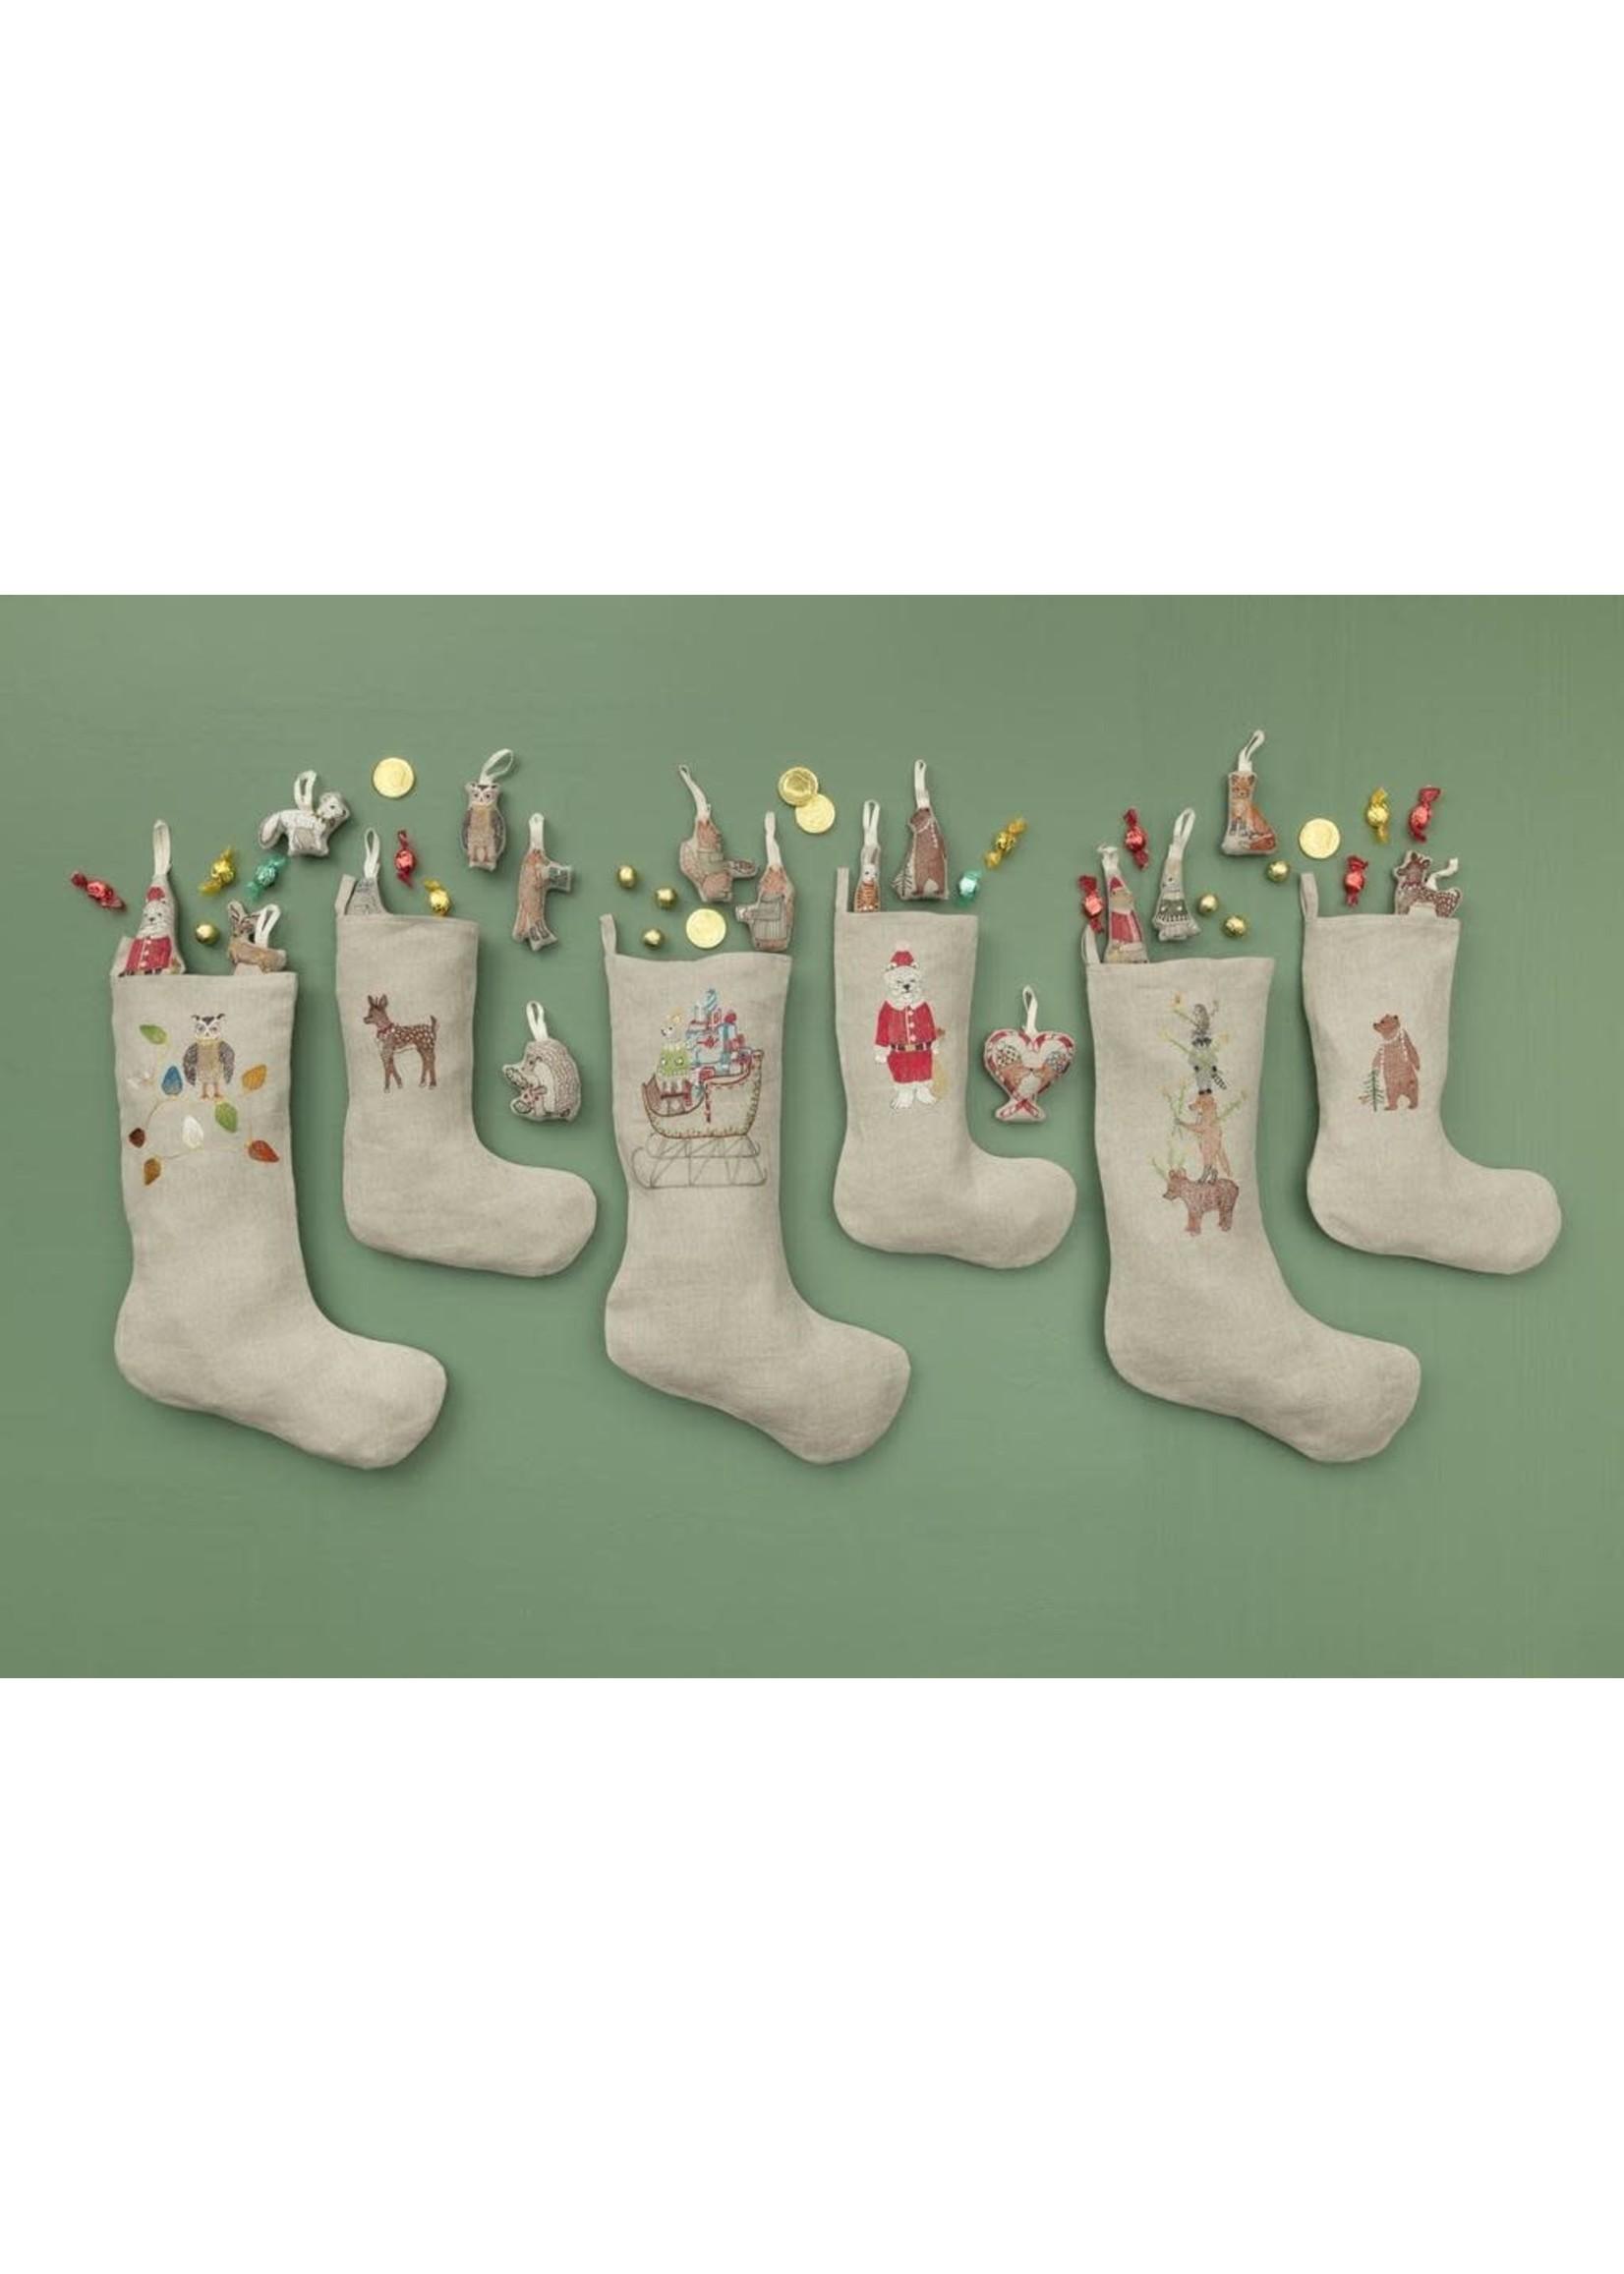 Coral and Tusk Stocking - Santa's Sleigh - Large